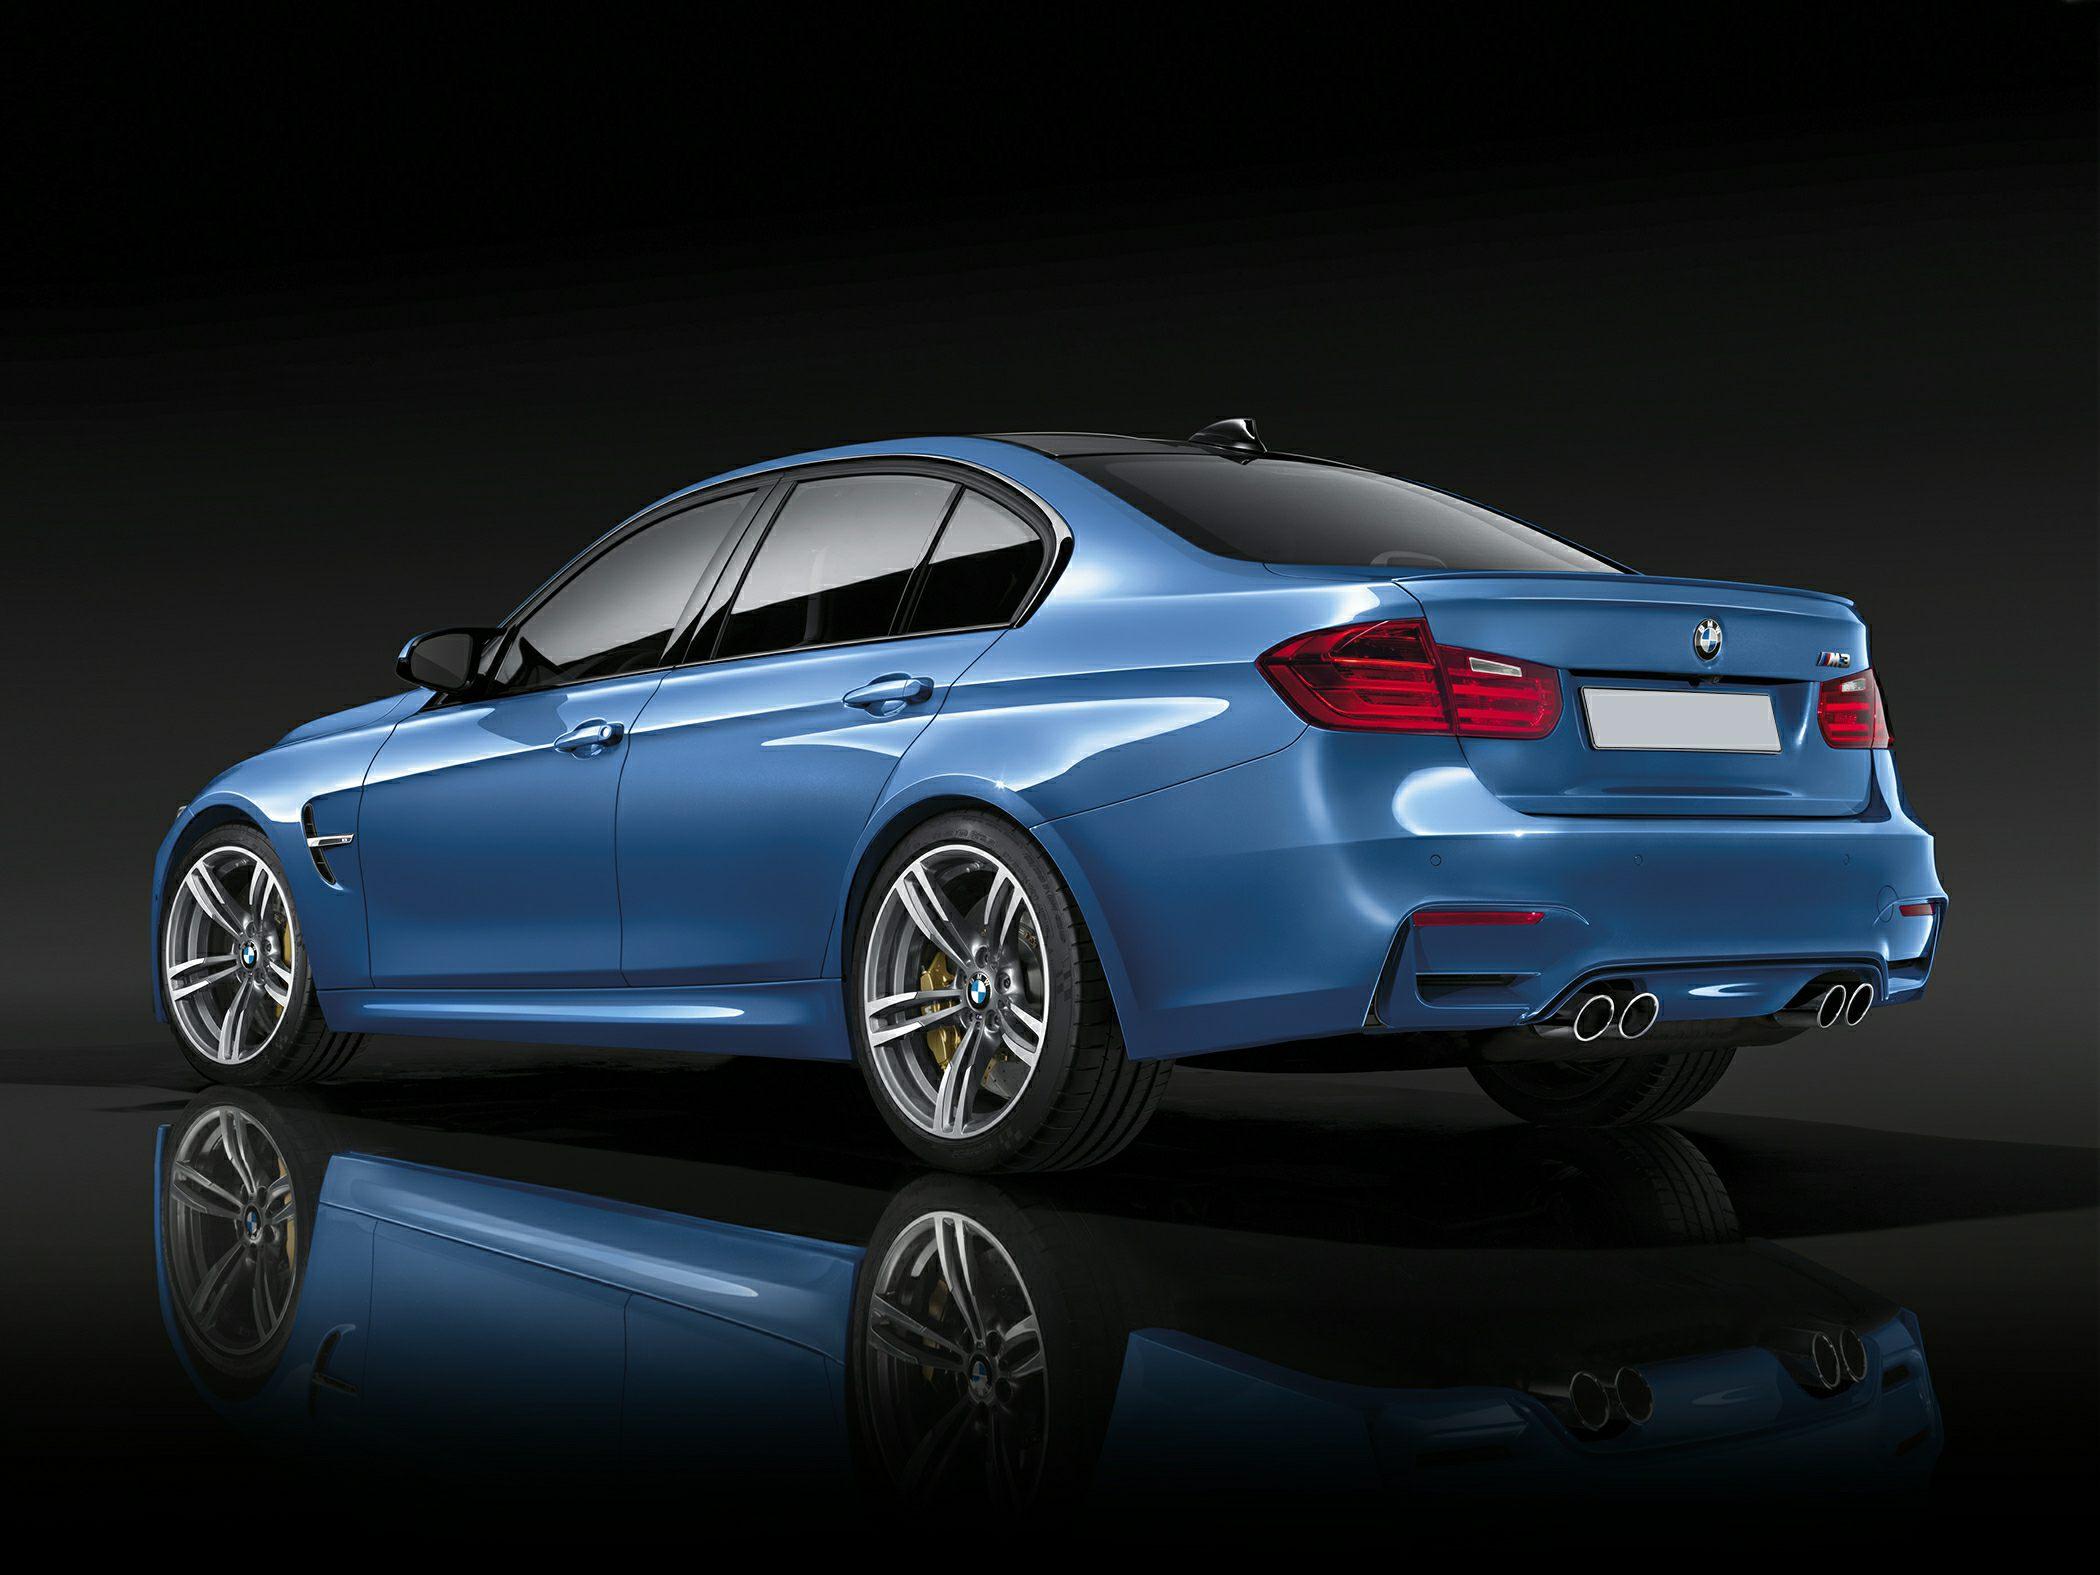 2015 BMW M3 Glamour